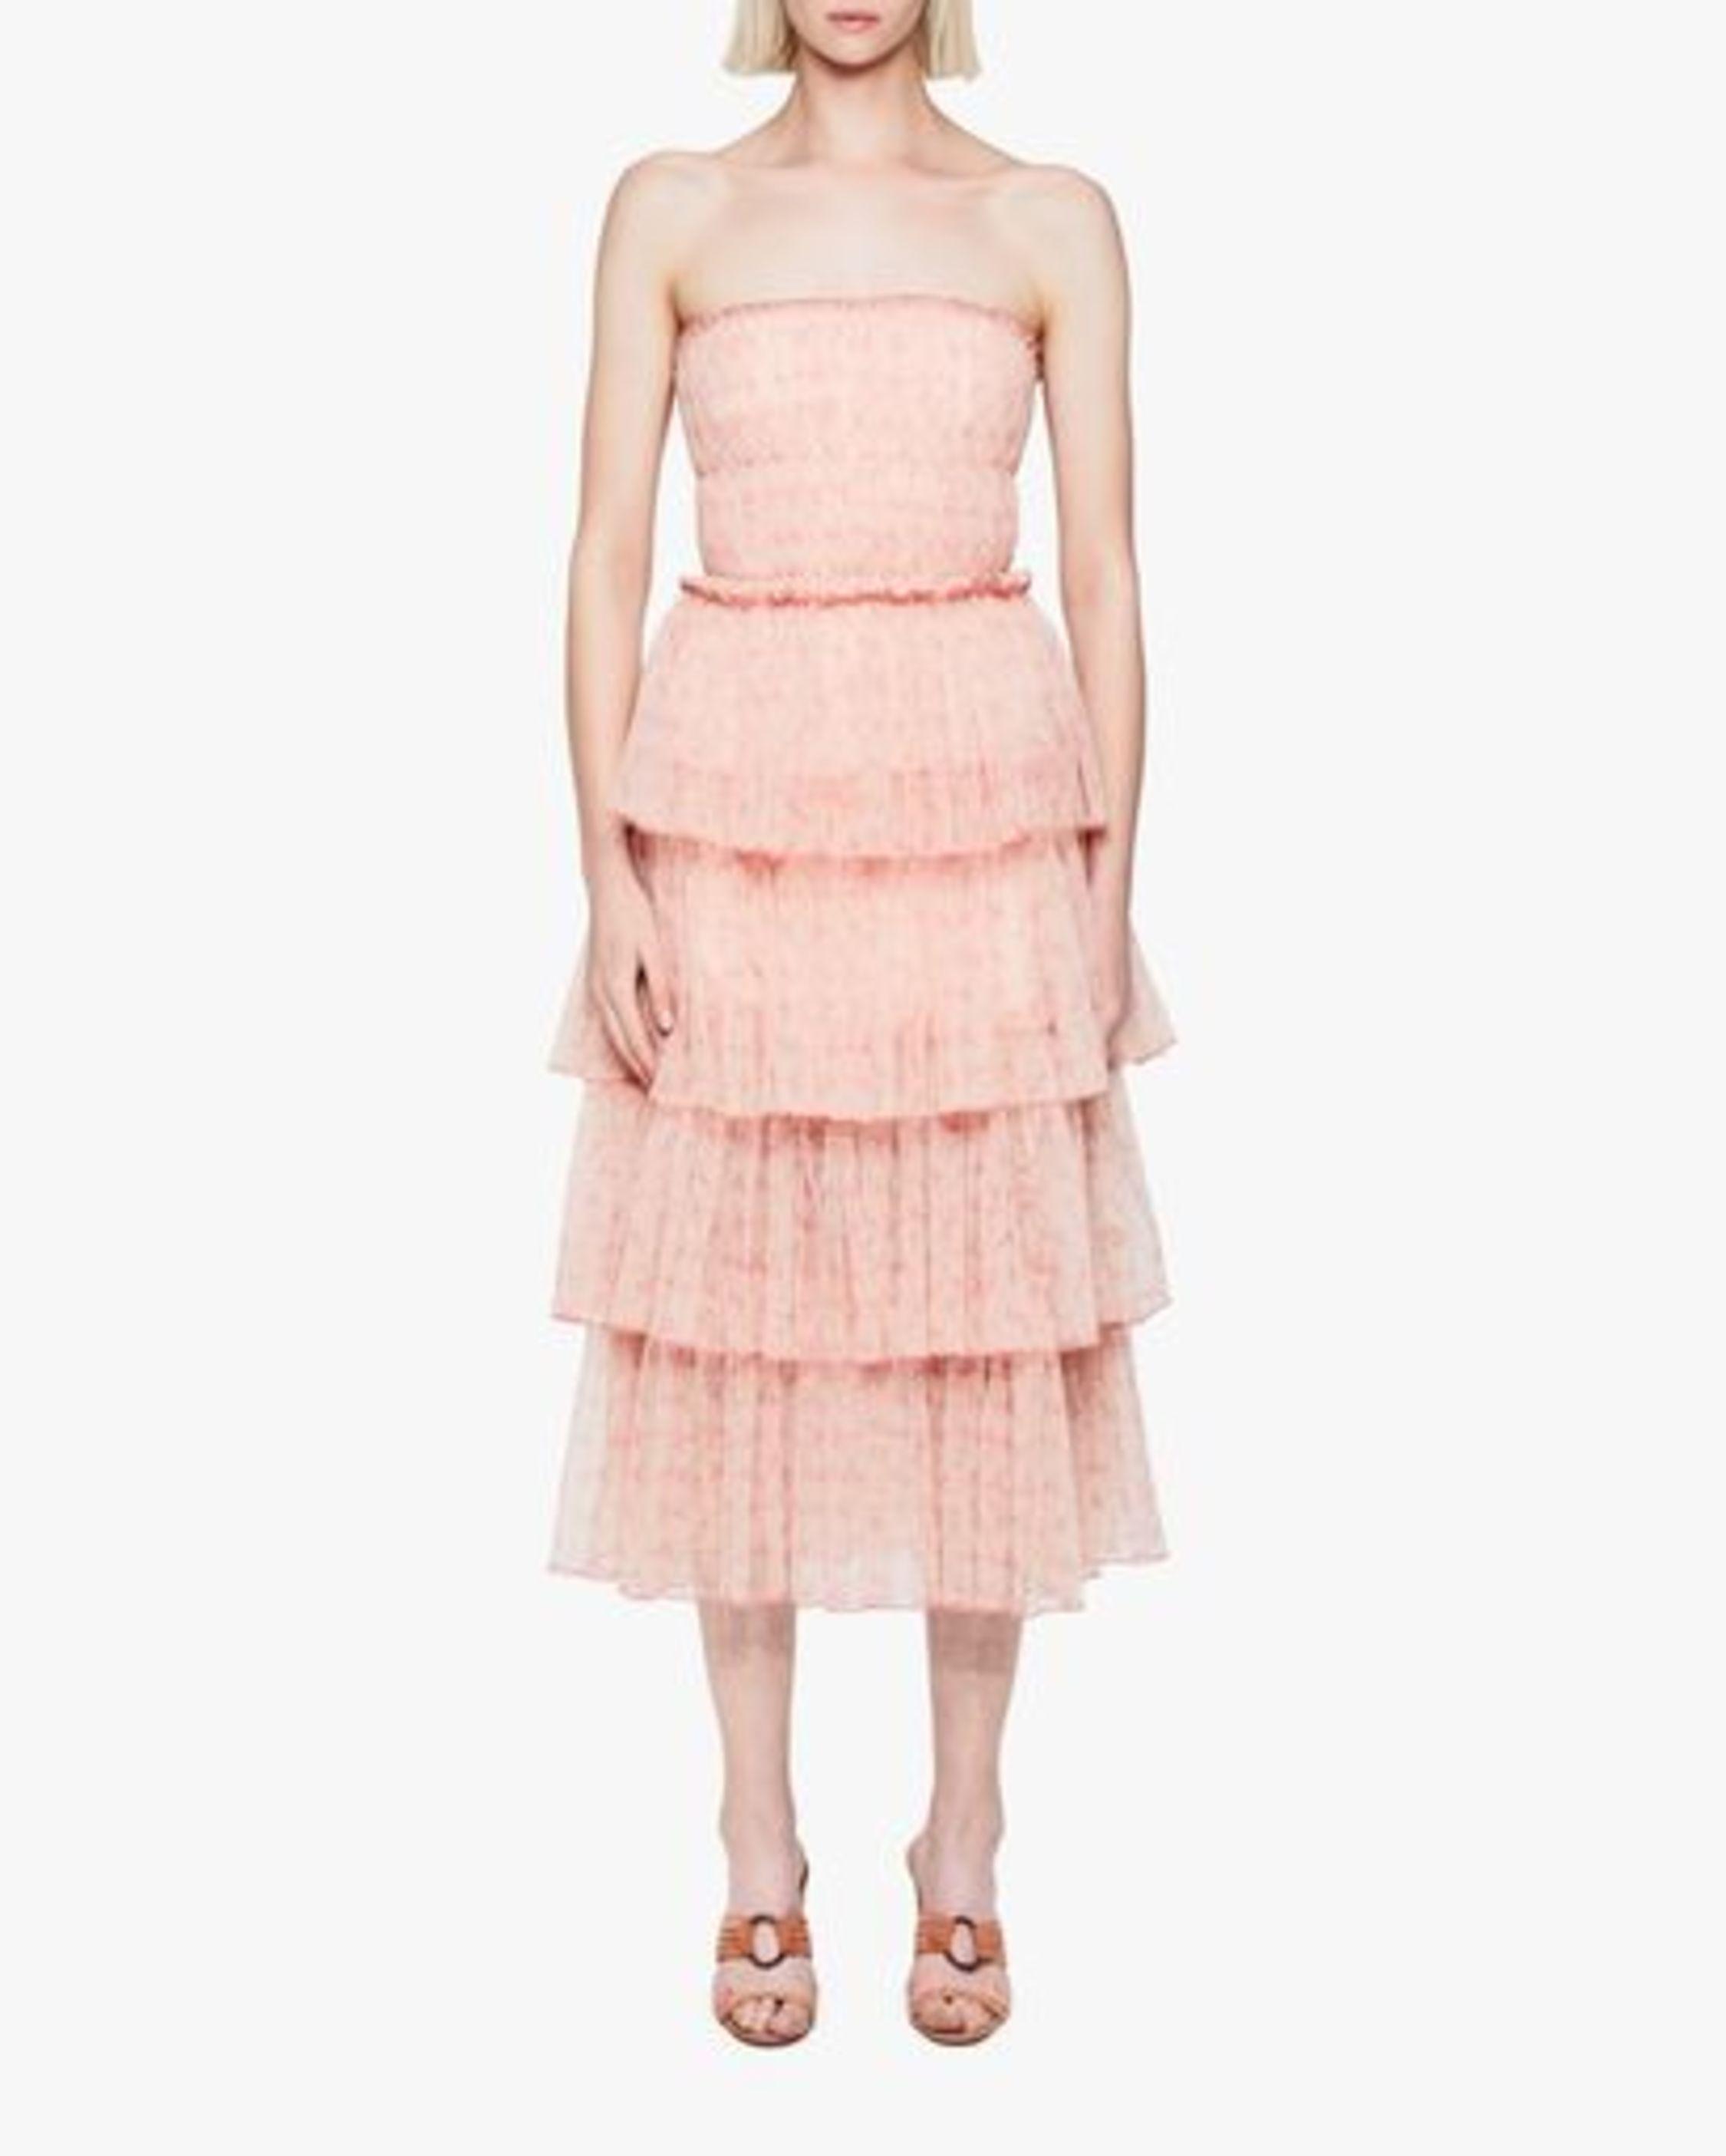 Jonathan Simkhai Haryln Tulle Midi Dress 1